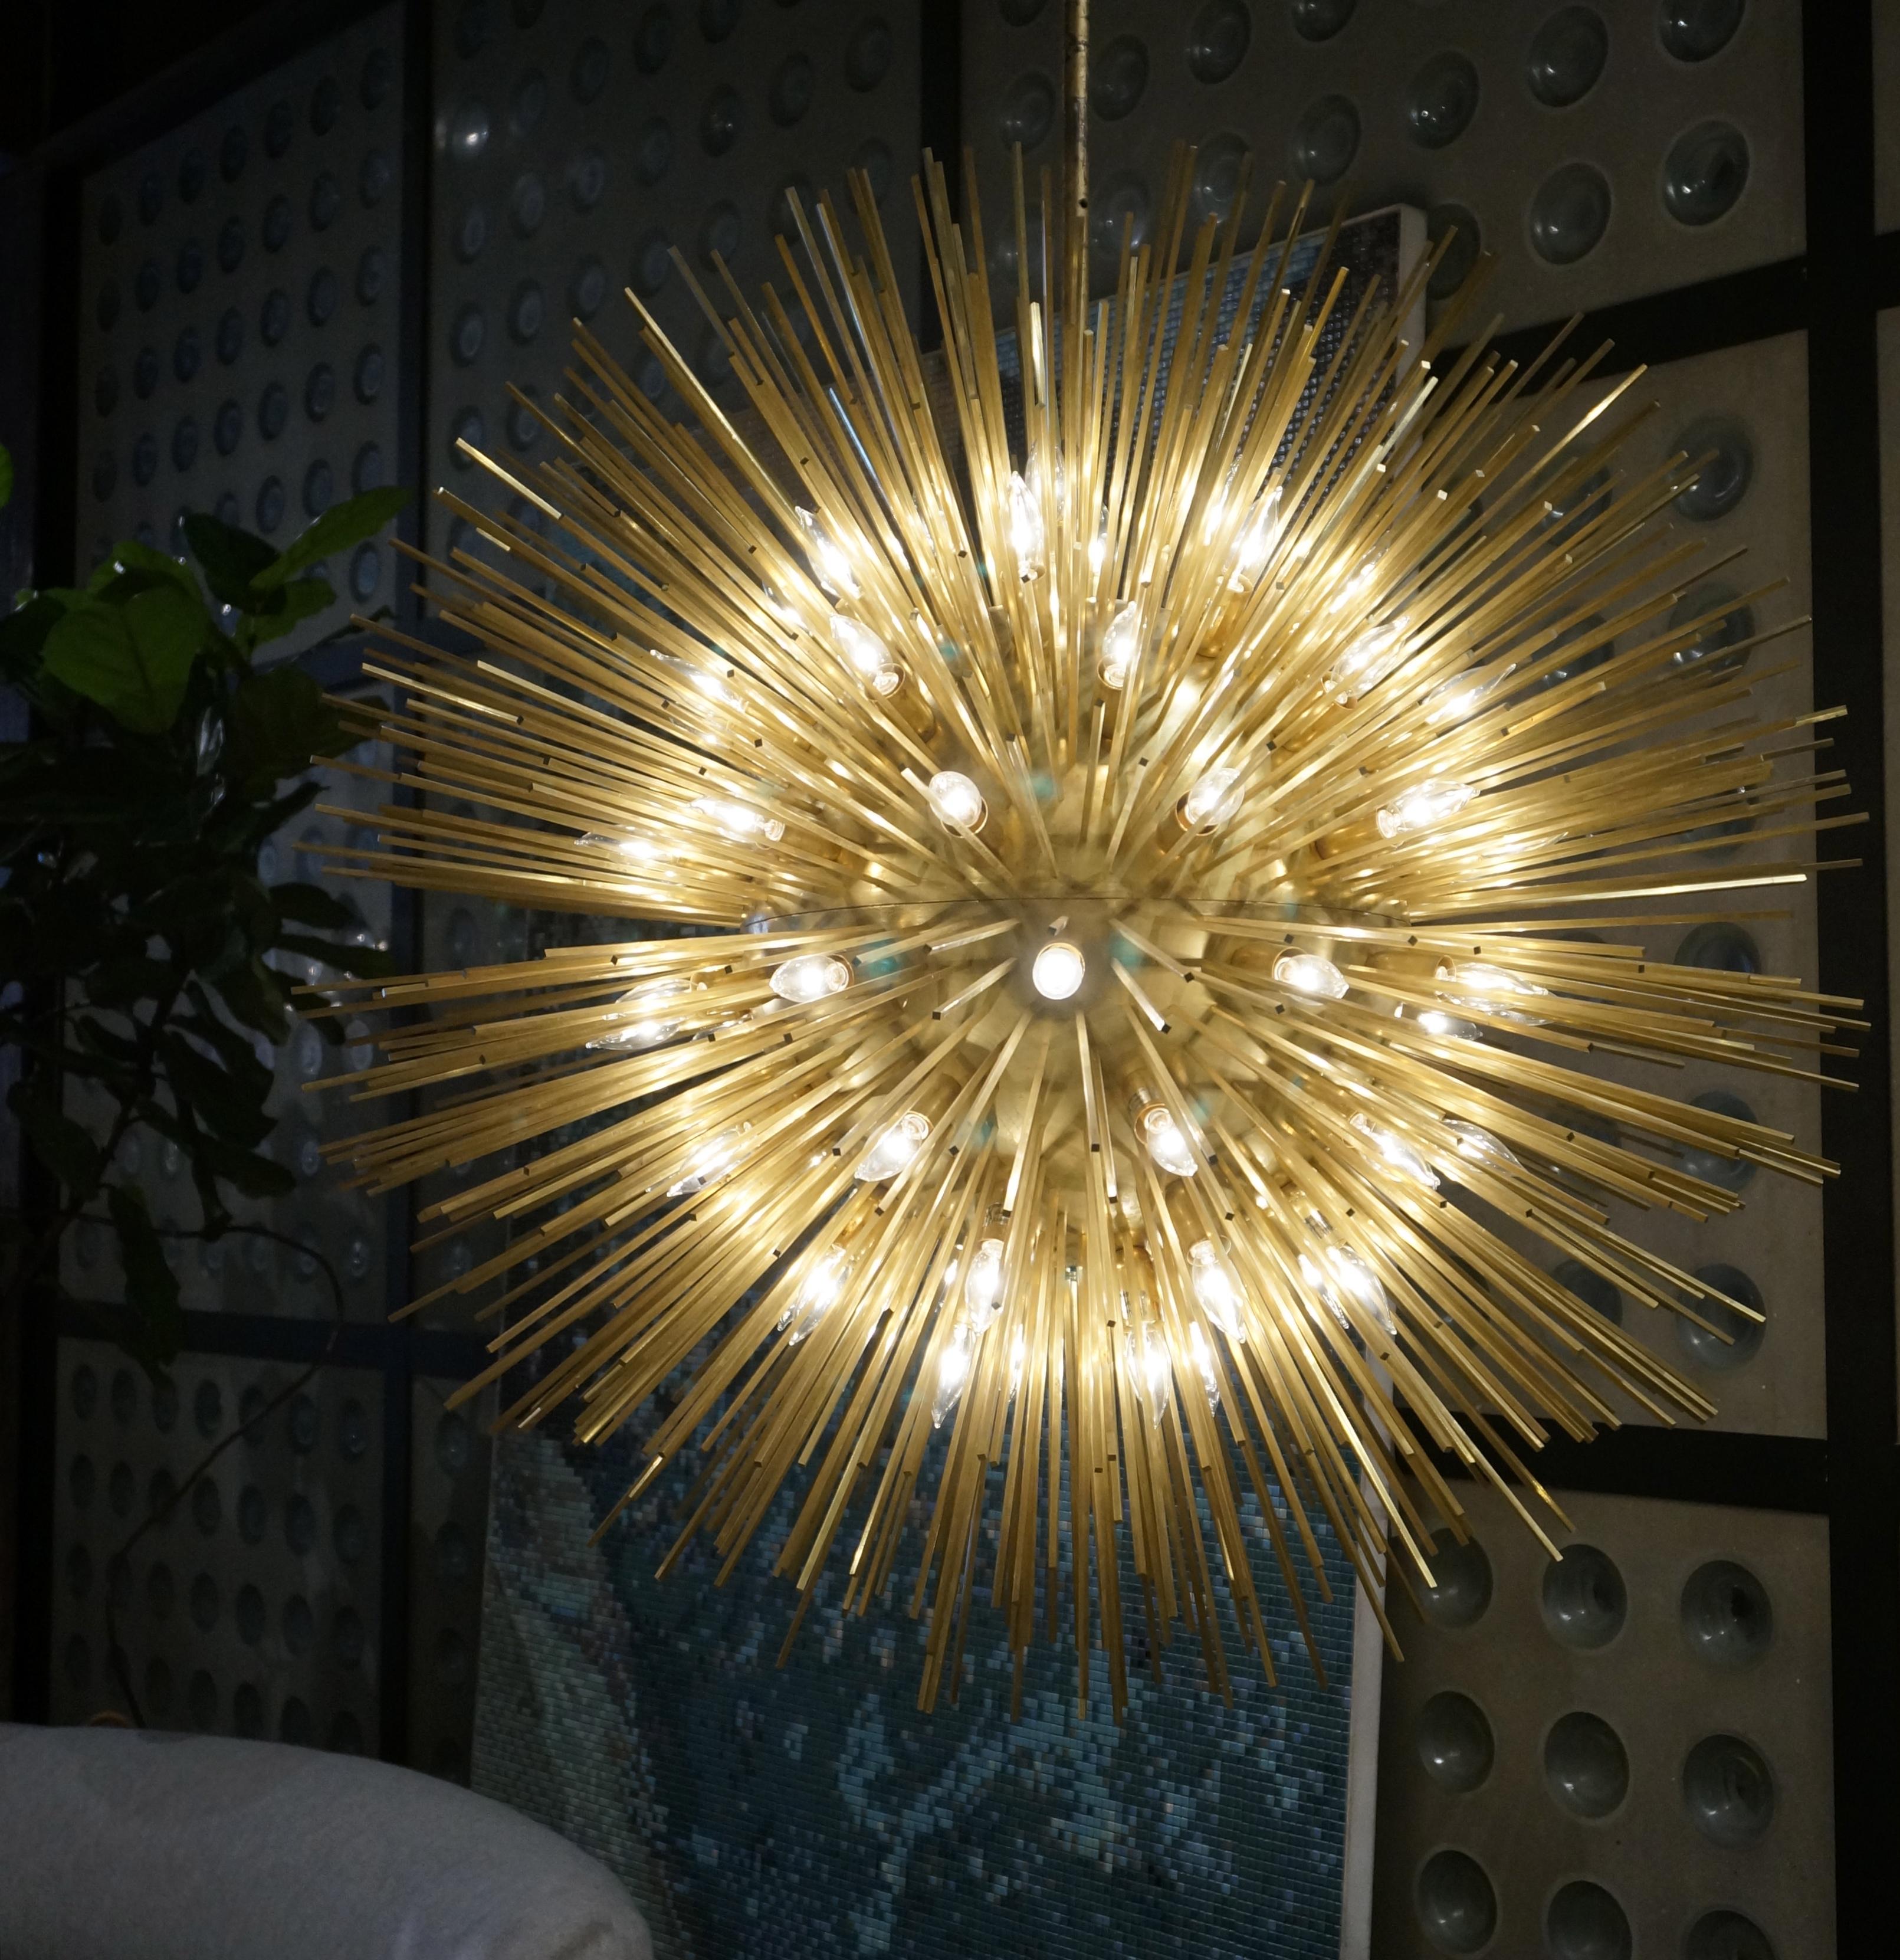 Alonzo king on creativity - Creative hanging lights ...